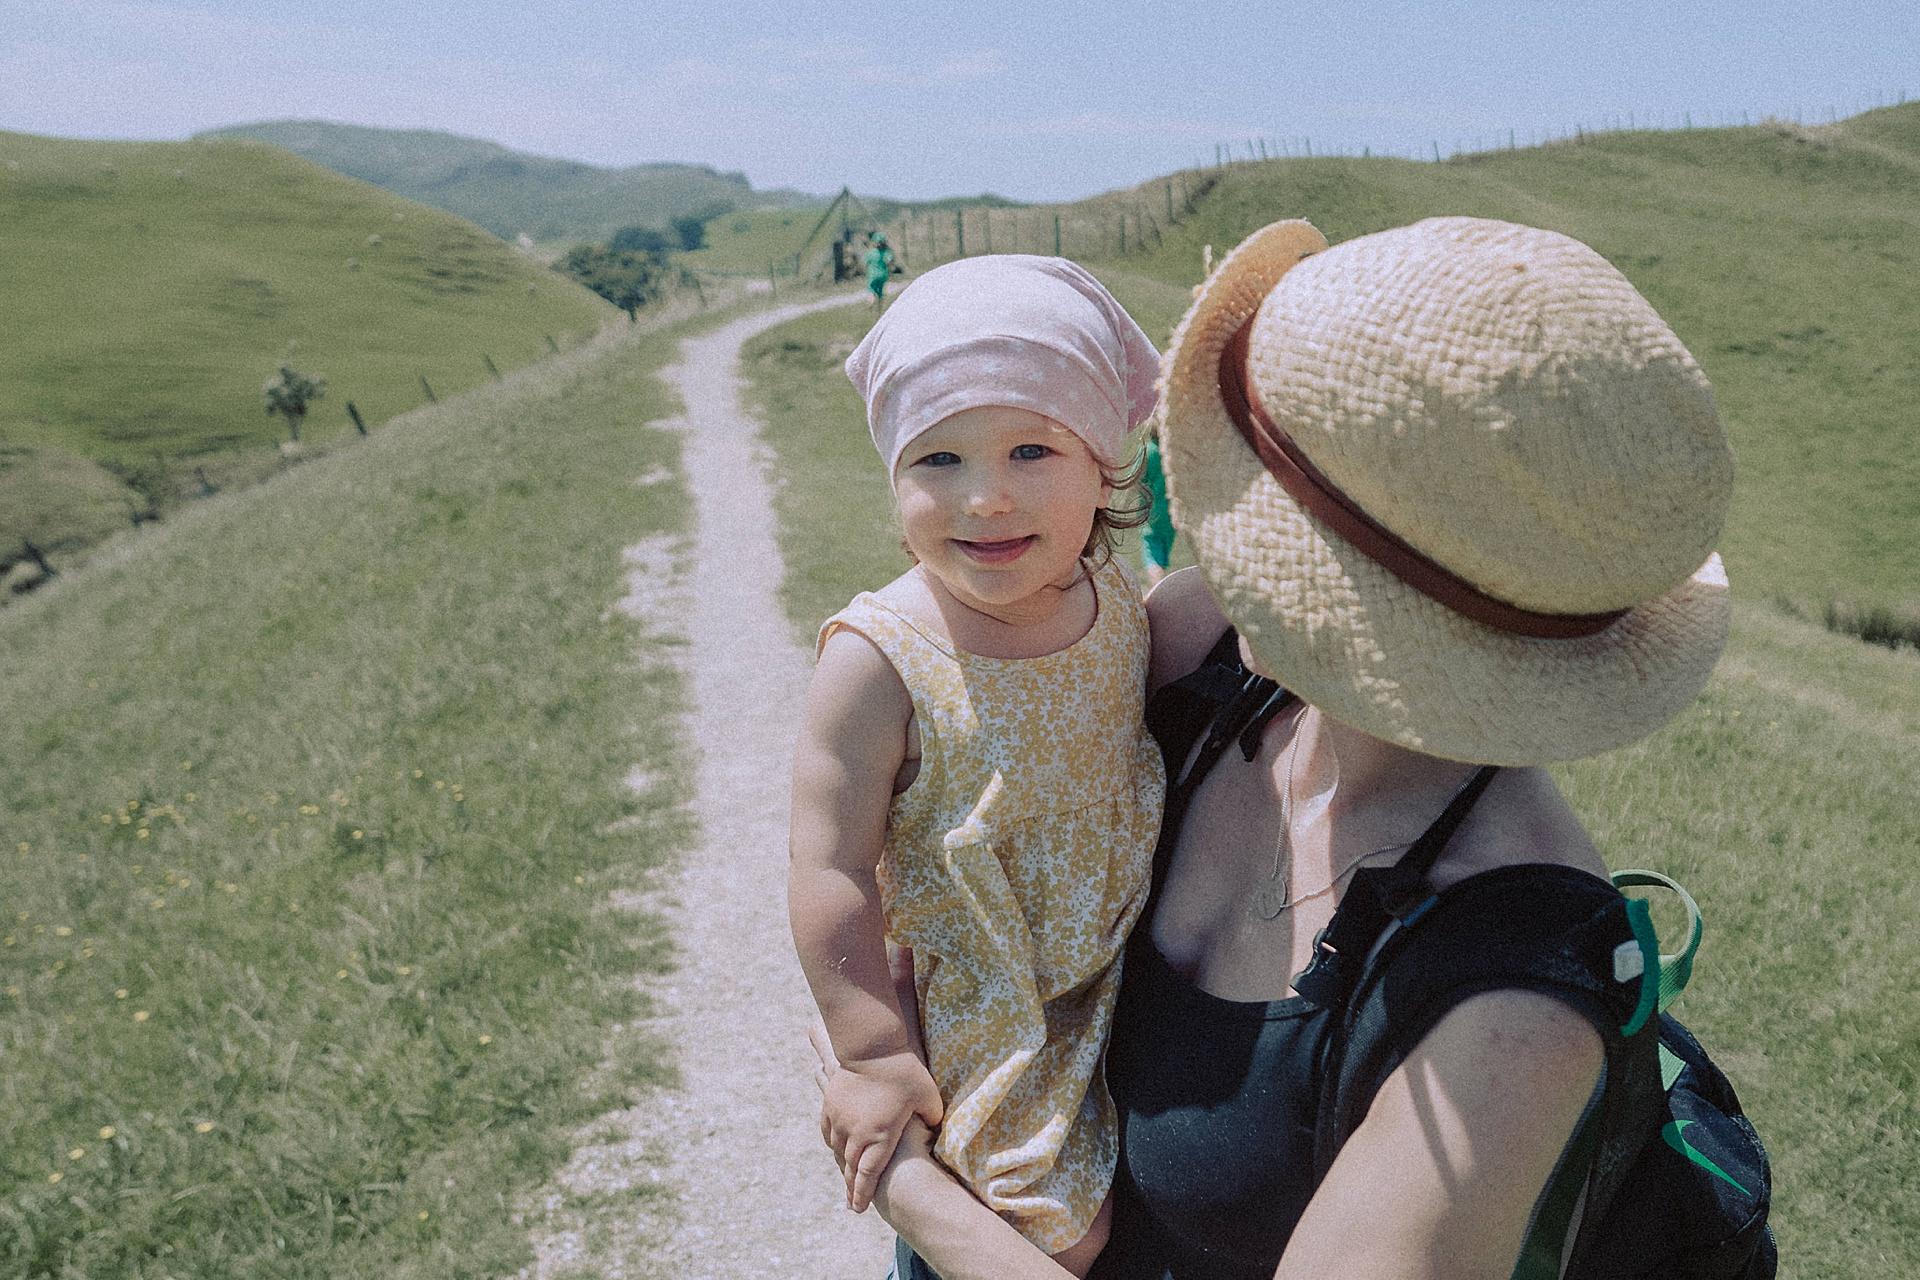 family-roadtrip-neuseeland-travelnewzealand-danielzube_0592.jpg